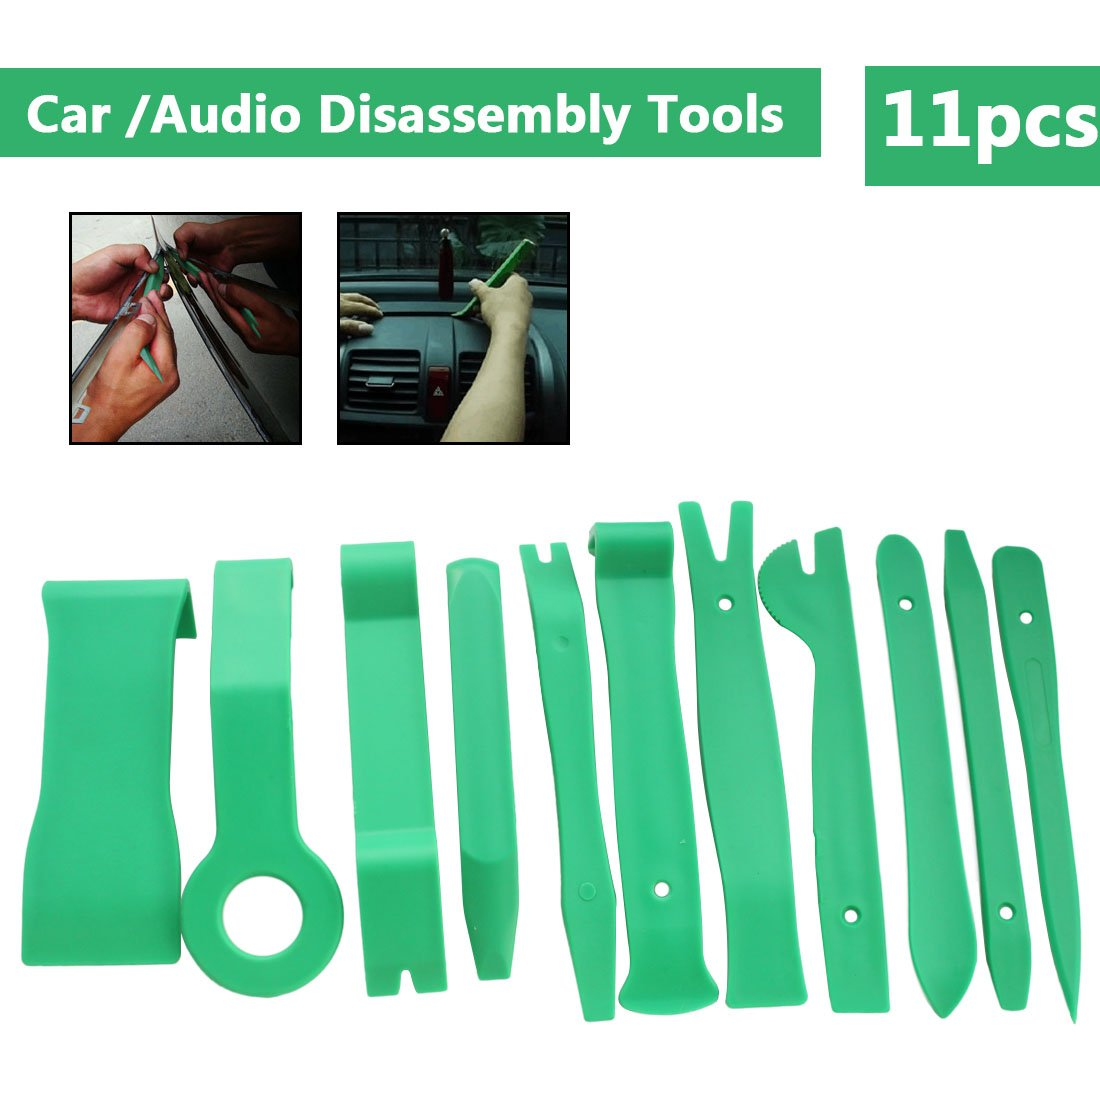 Topsame 11Pcs Auto Car Radio Panel Interior Door Clip Panel Pry Tool Trim Dashboard Removal Opening Tool Set DIY Car Repair Tool Kit